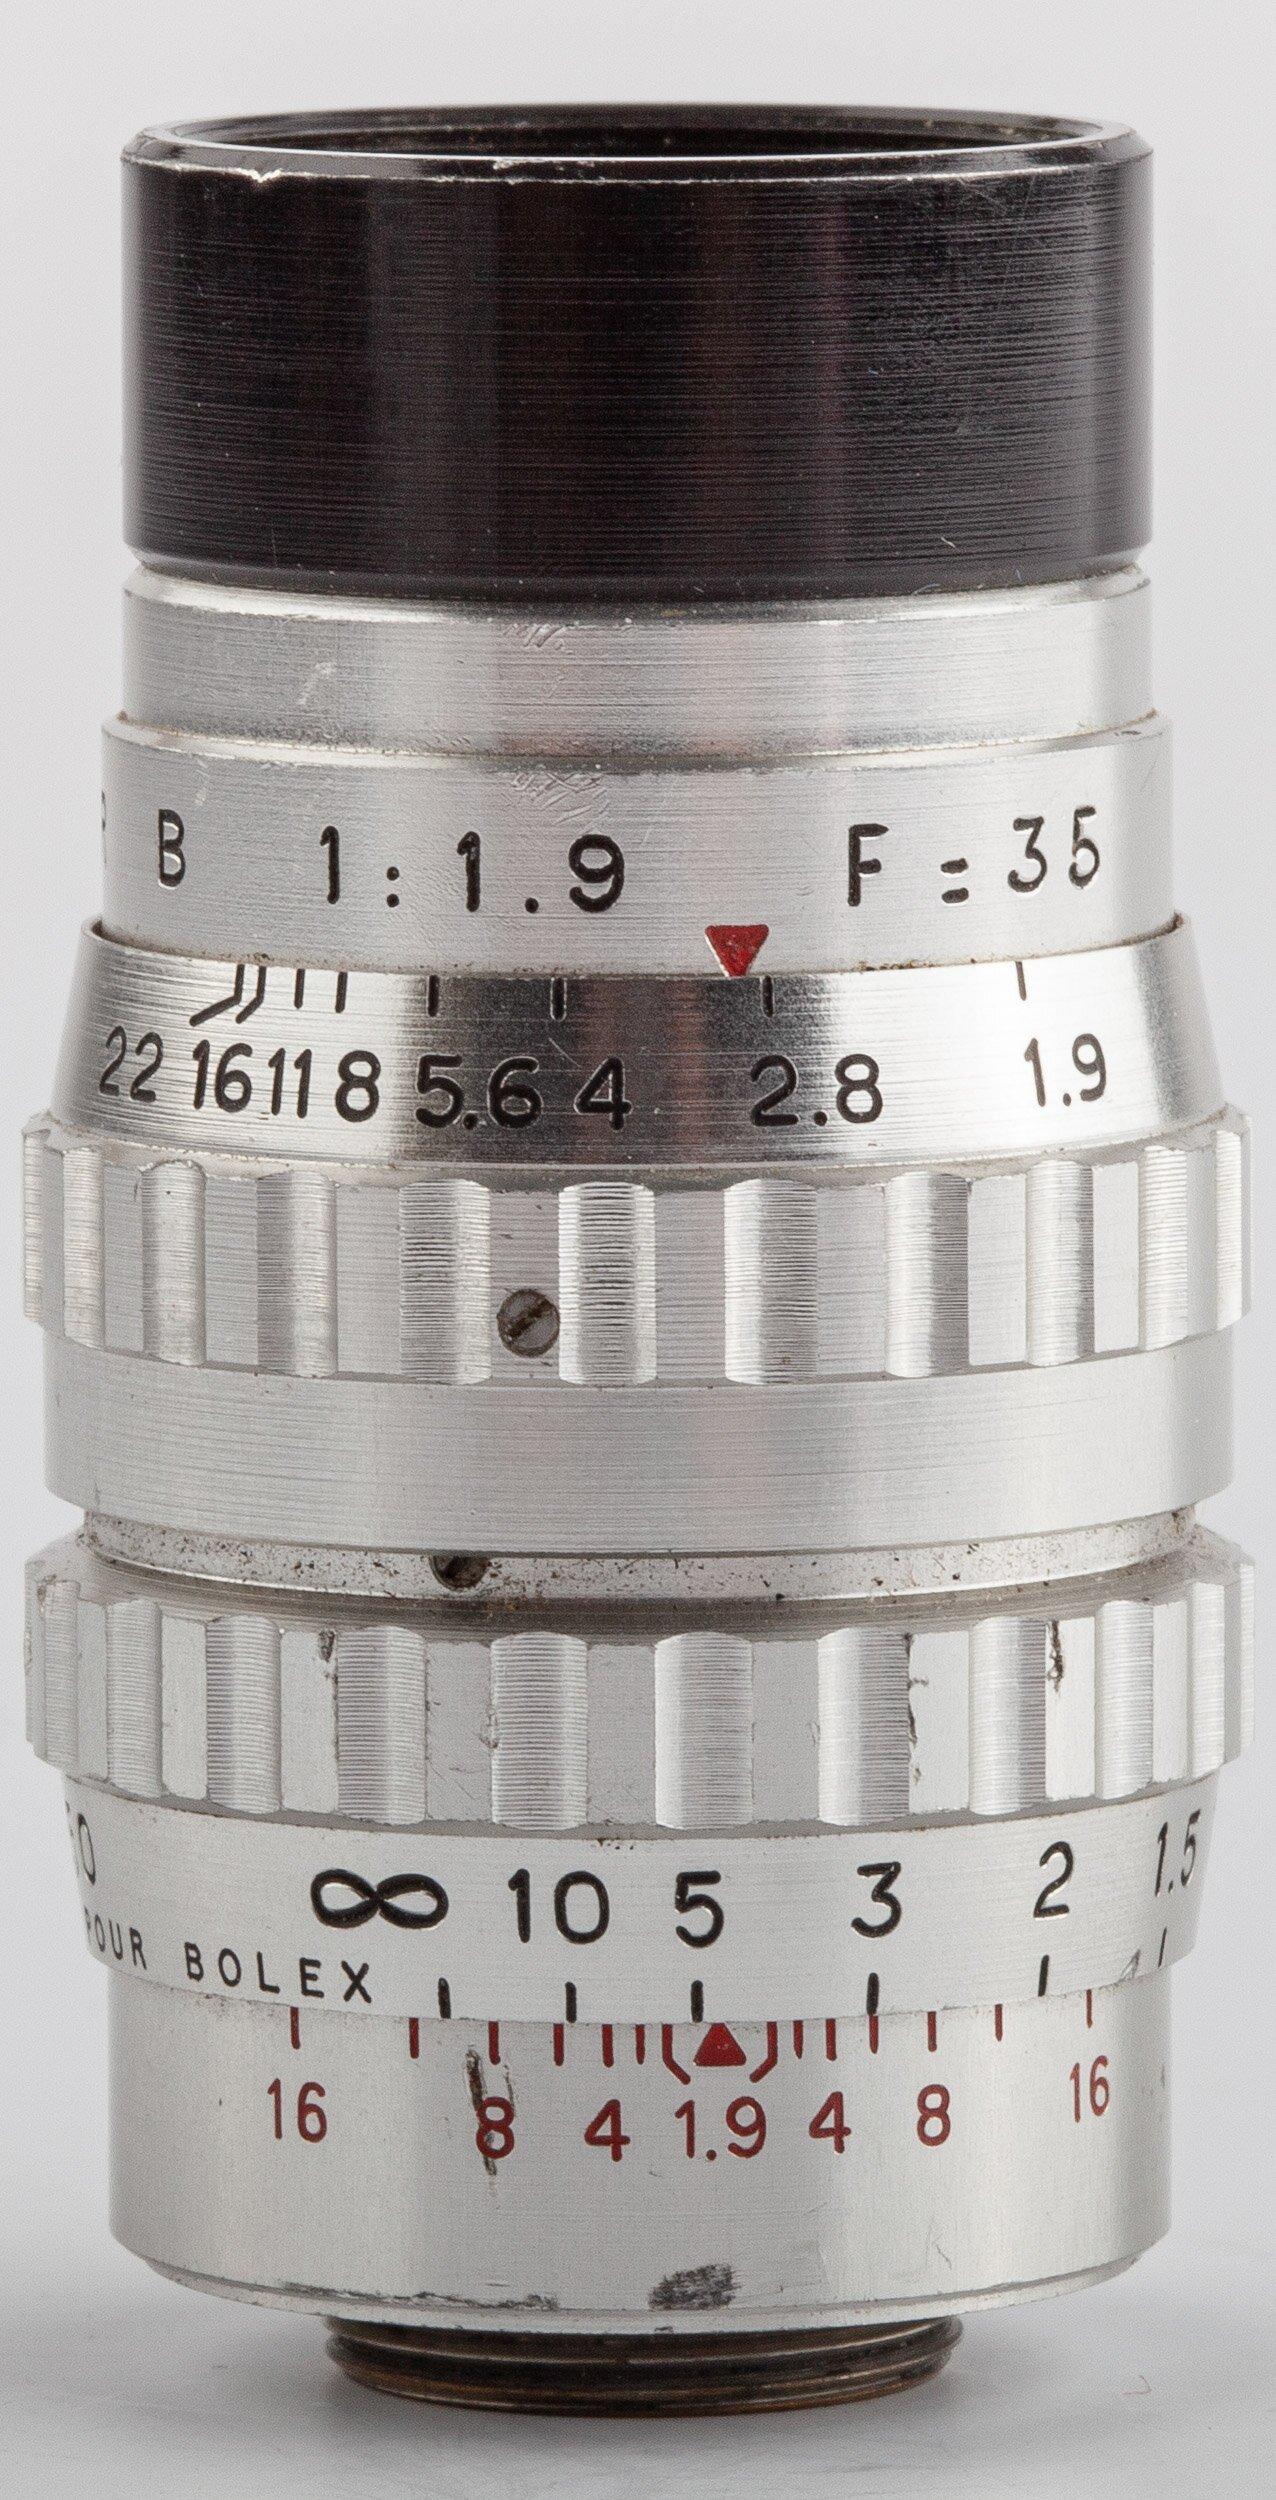 SOM Berthiot Cinor B 1,9/35mm d-mount